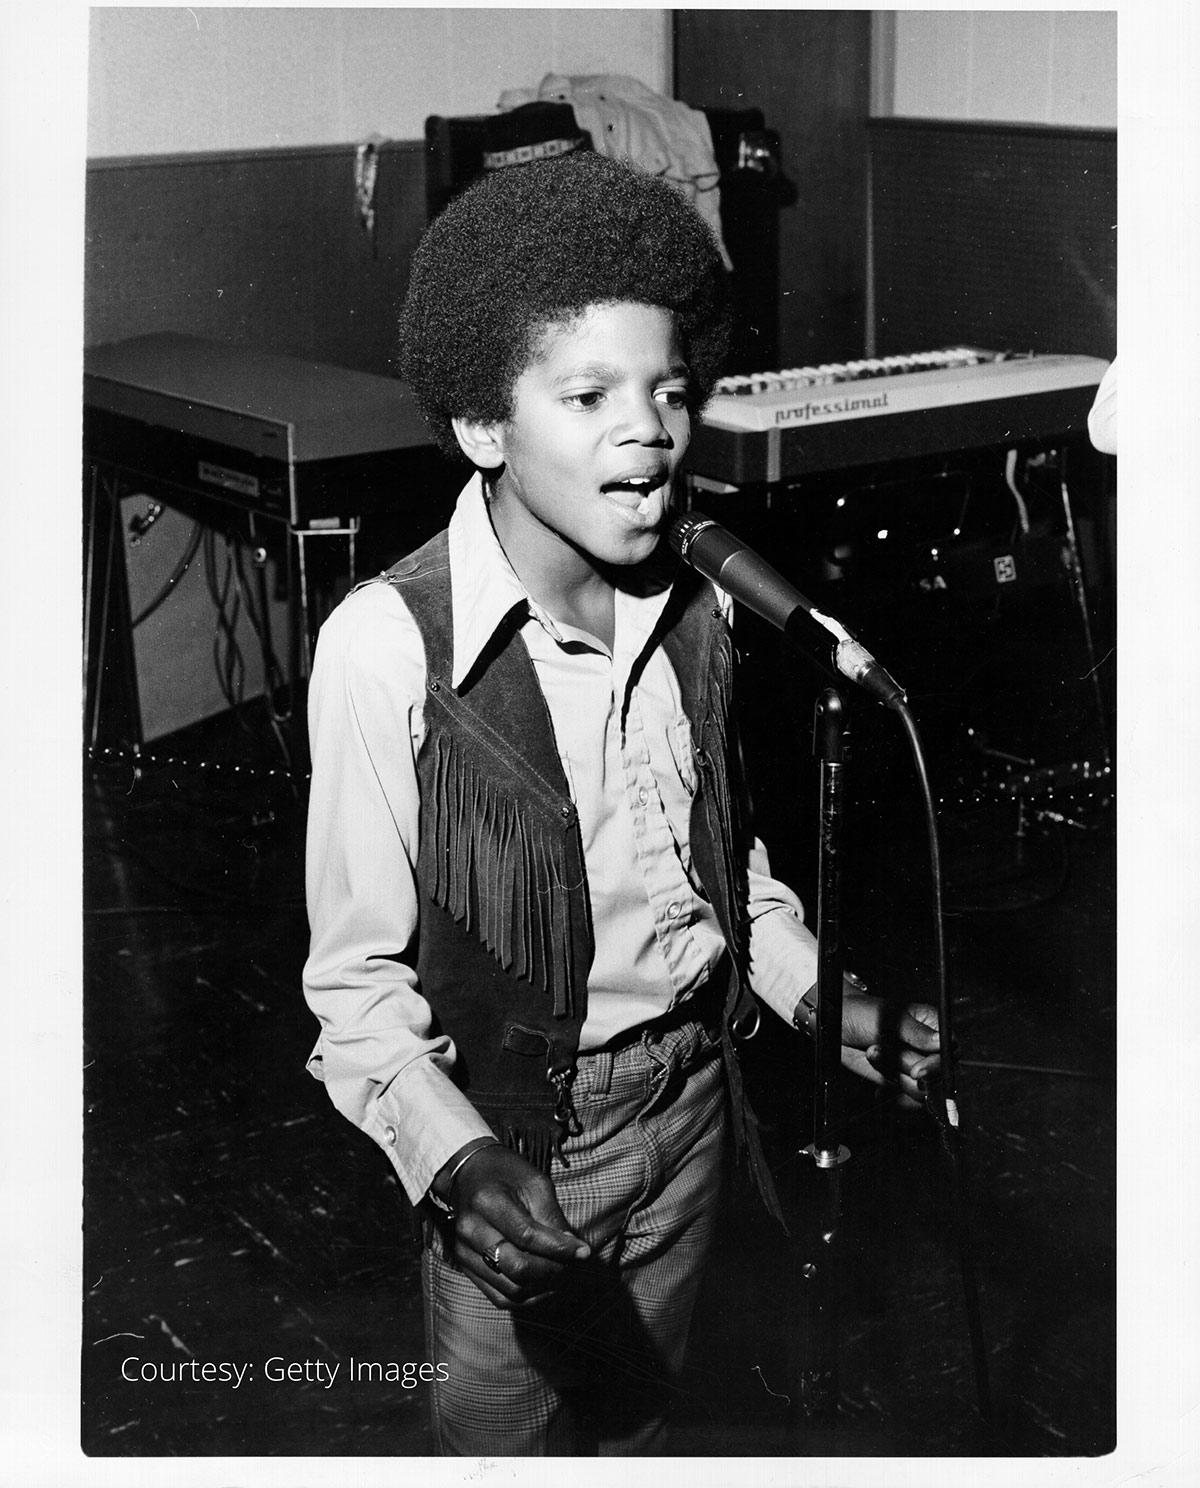 Michael Jackson performs onstage circa 1970